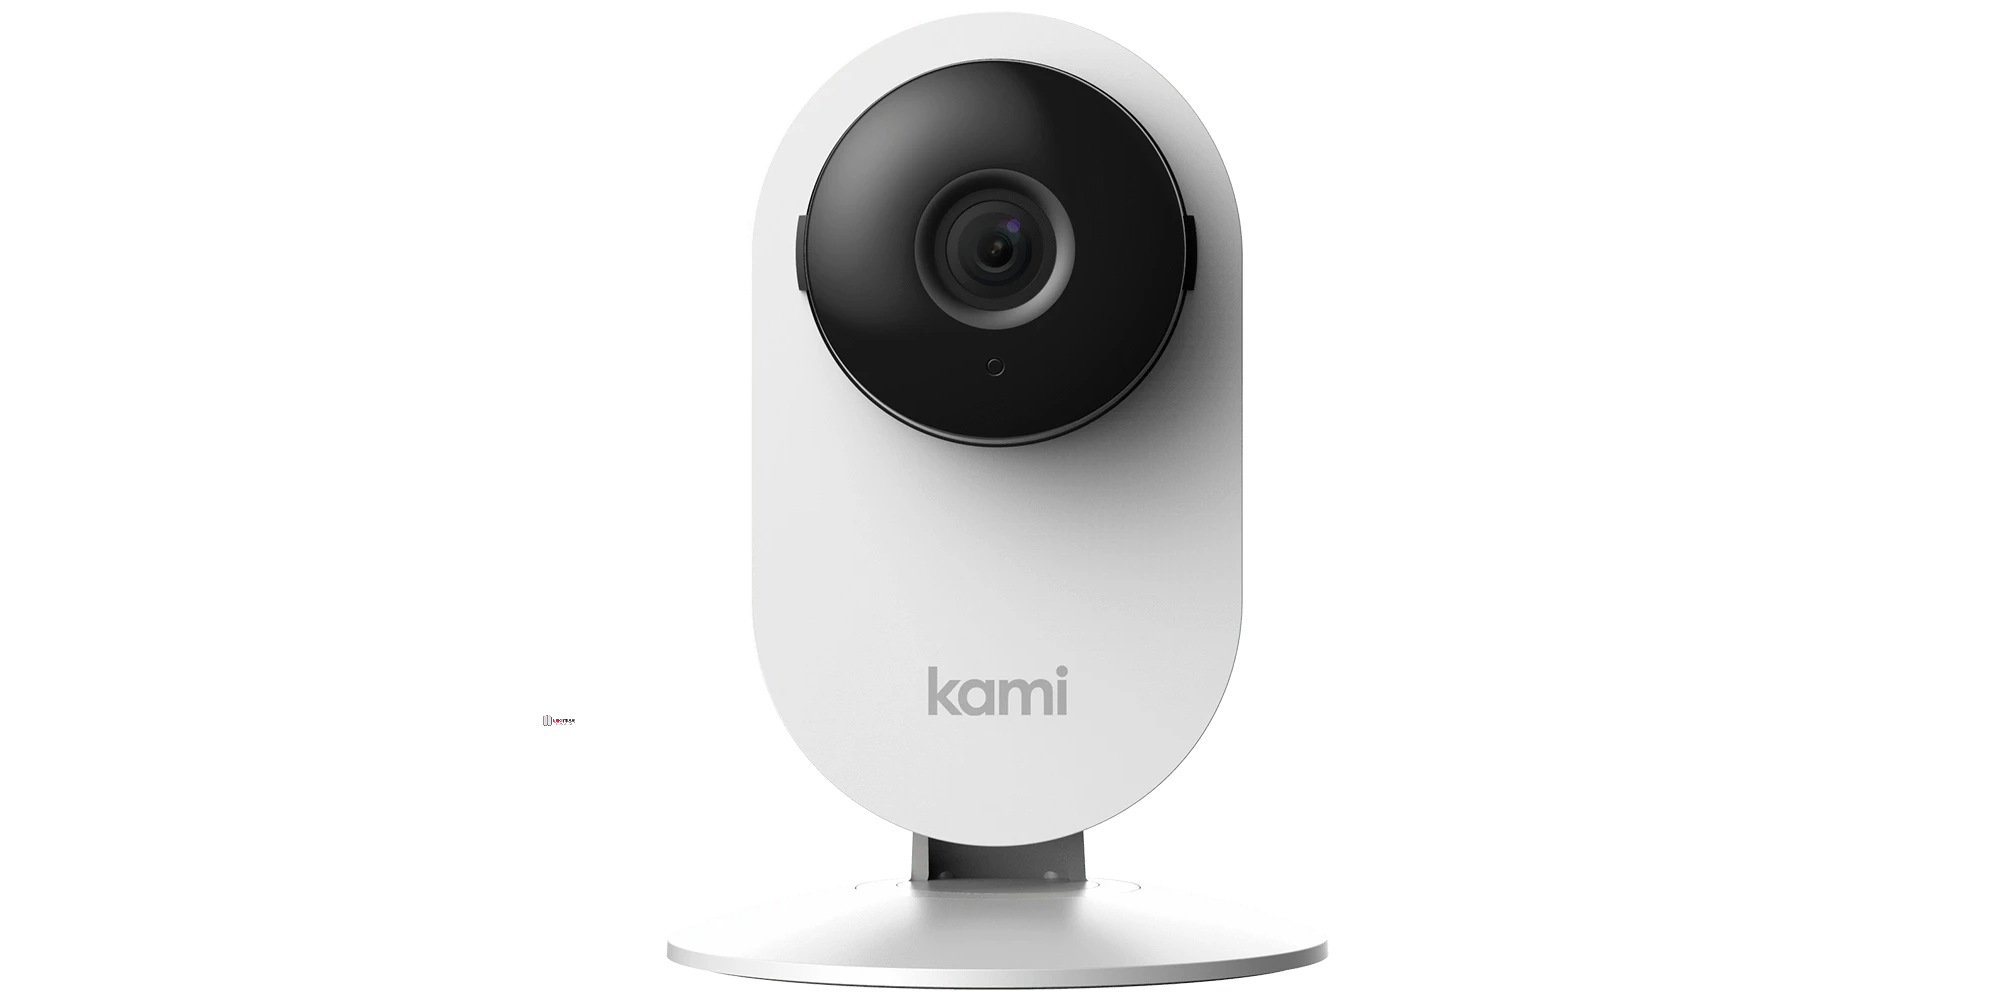 Kami mini Indoor security camera